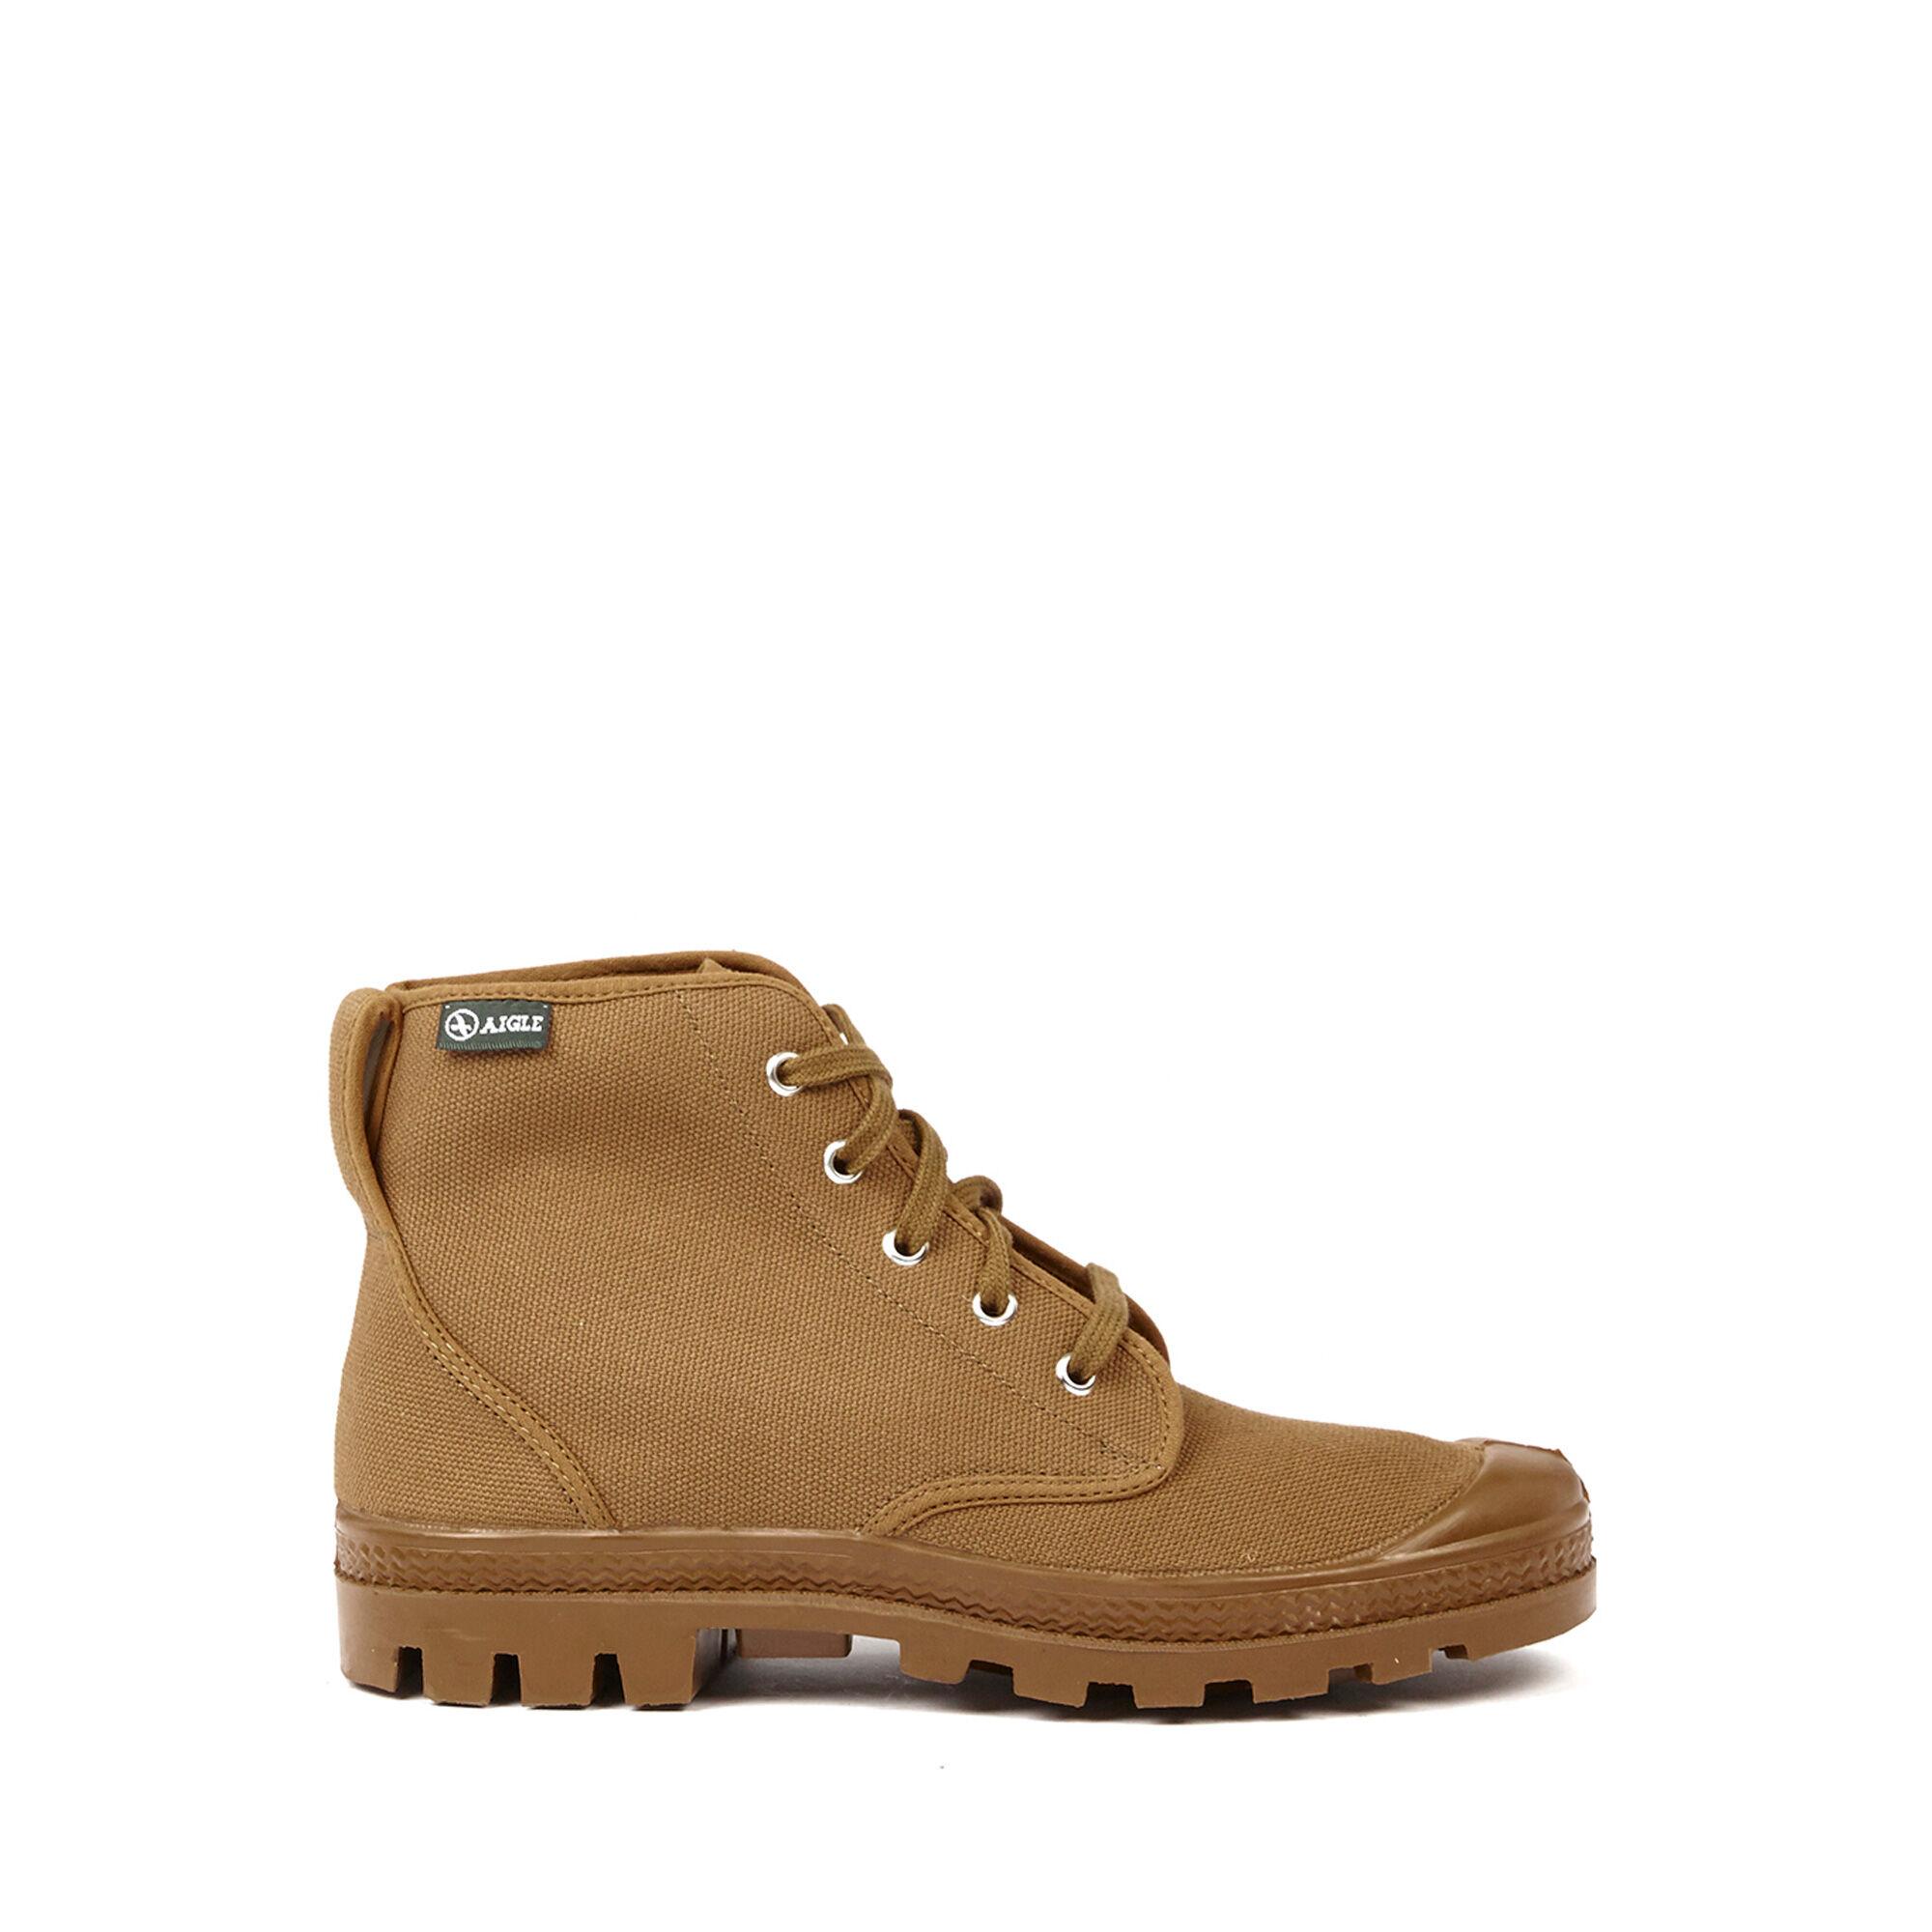 Arizona, Chaussures Multisport Outdoor Mixte Adulte, Vert (Kaki2), 42 EUAigle